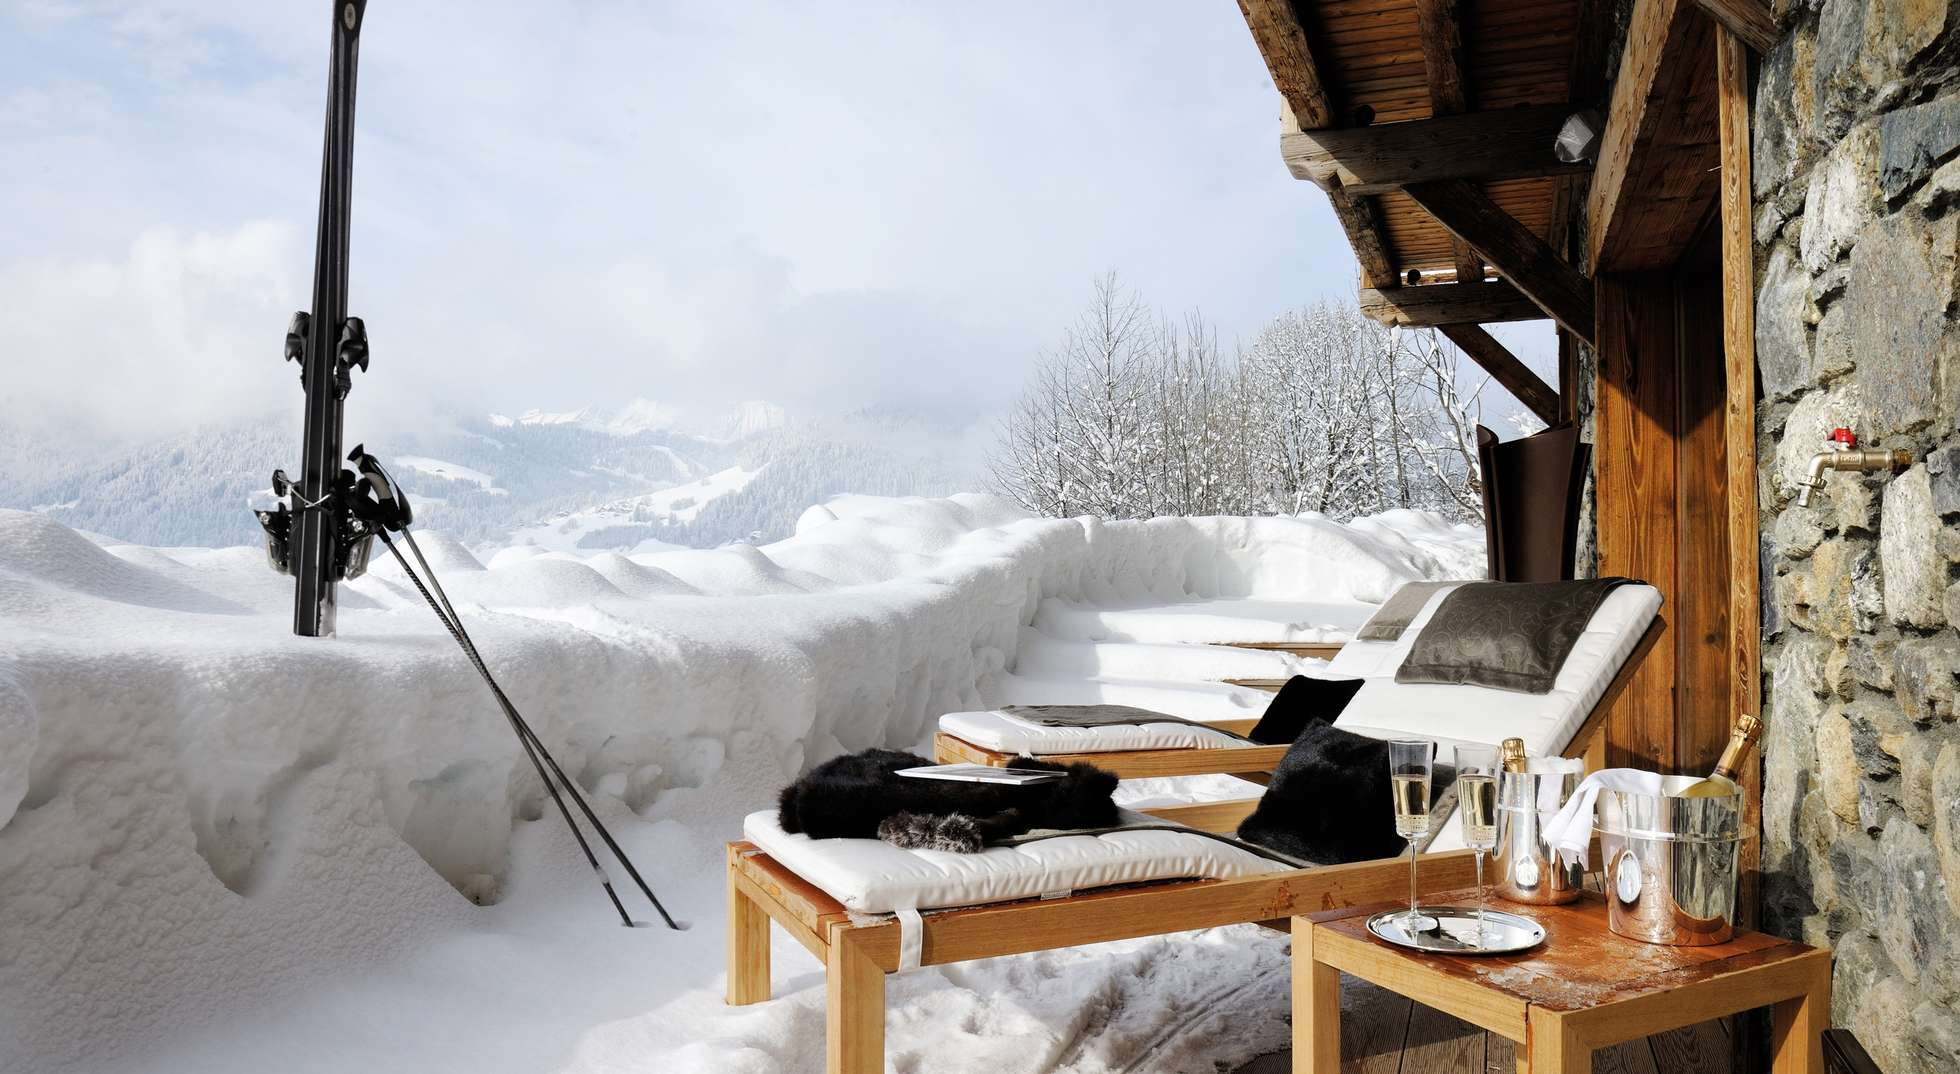 rent exclusive luxury villas discover stunning destinations indulge in our unique concierge service